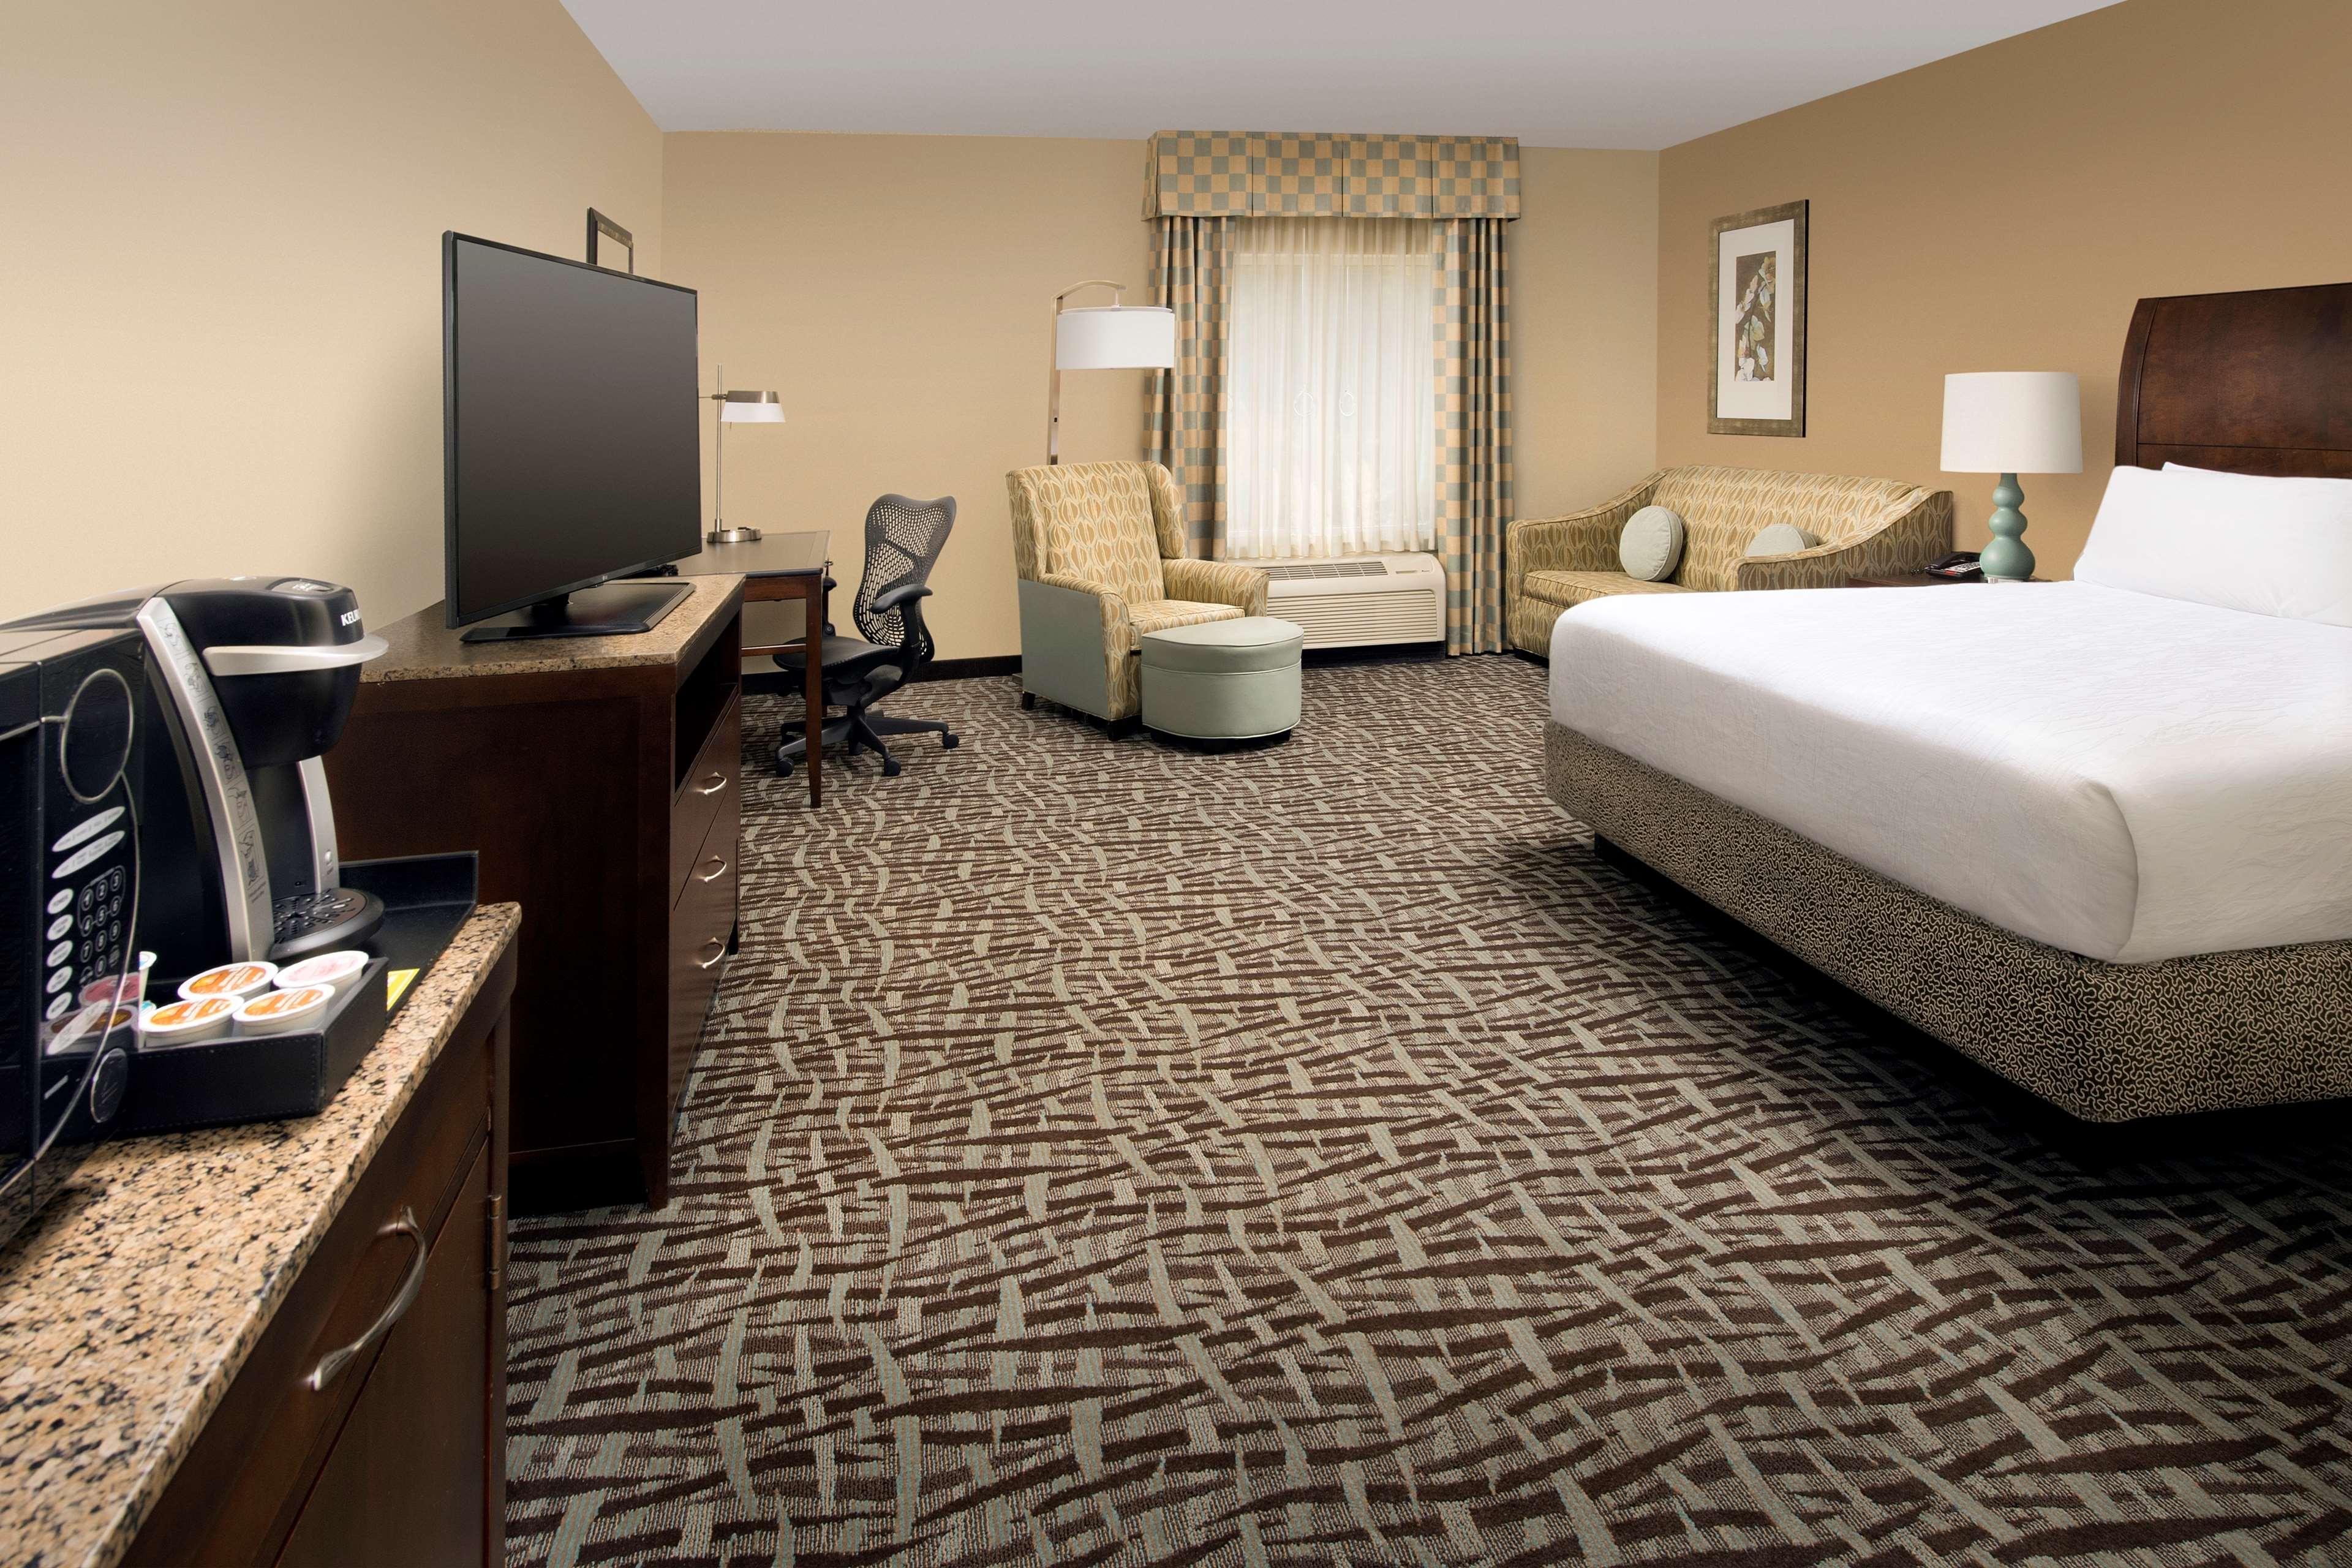 Hilton Garden Inn Winston-Salem/Hanes Mall image 22